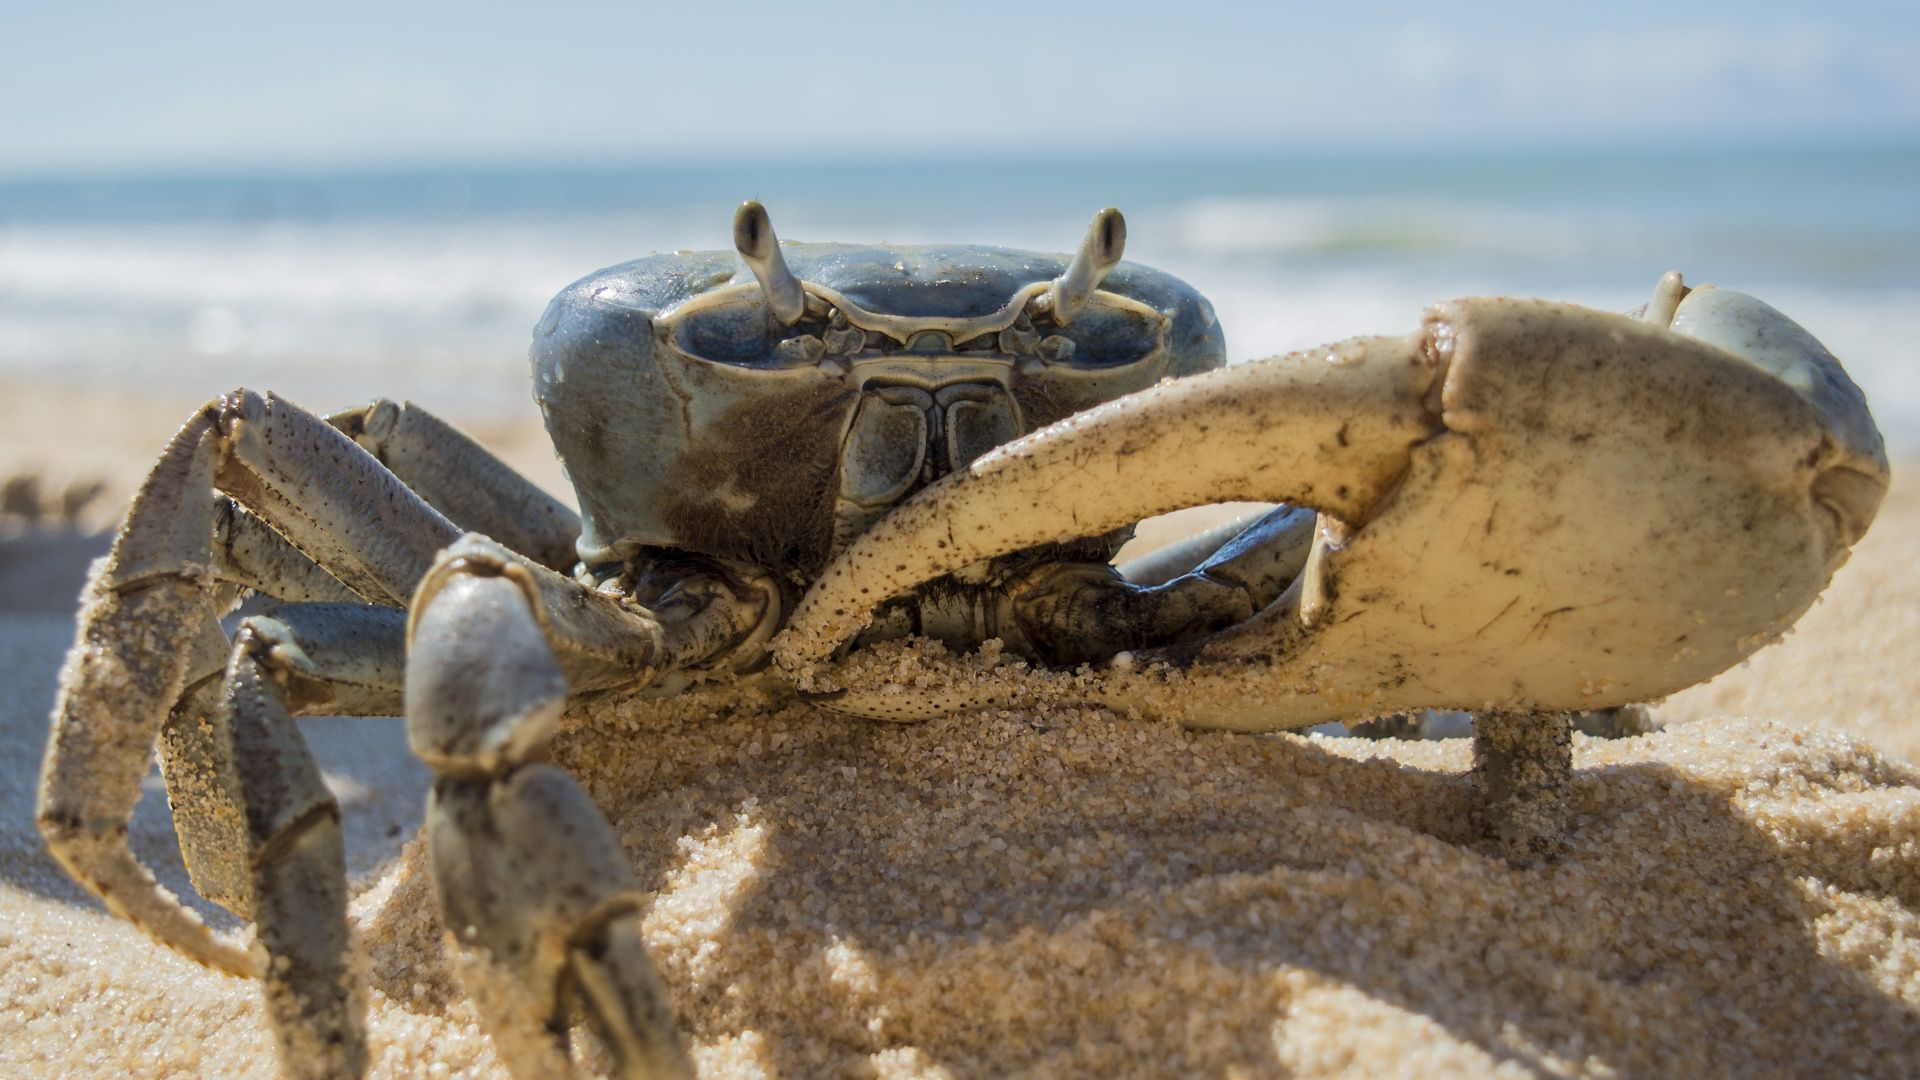 Crab desktop wallpaper download